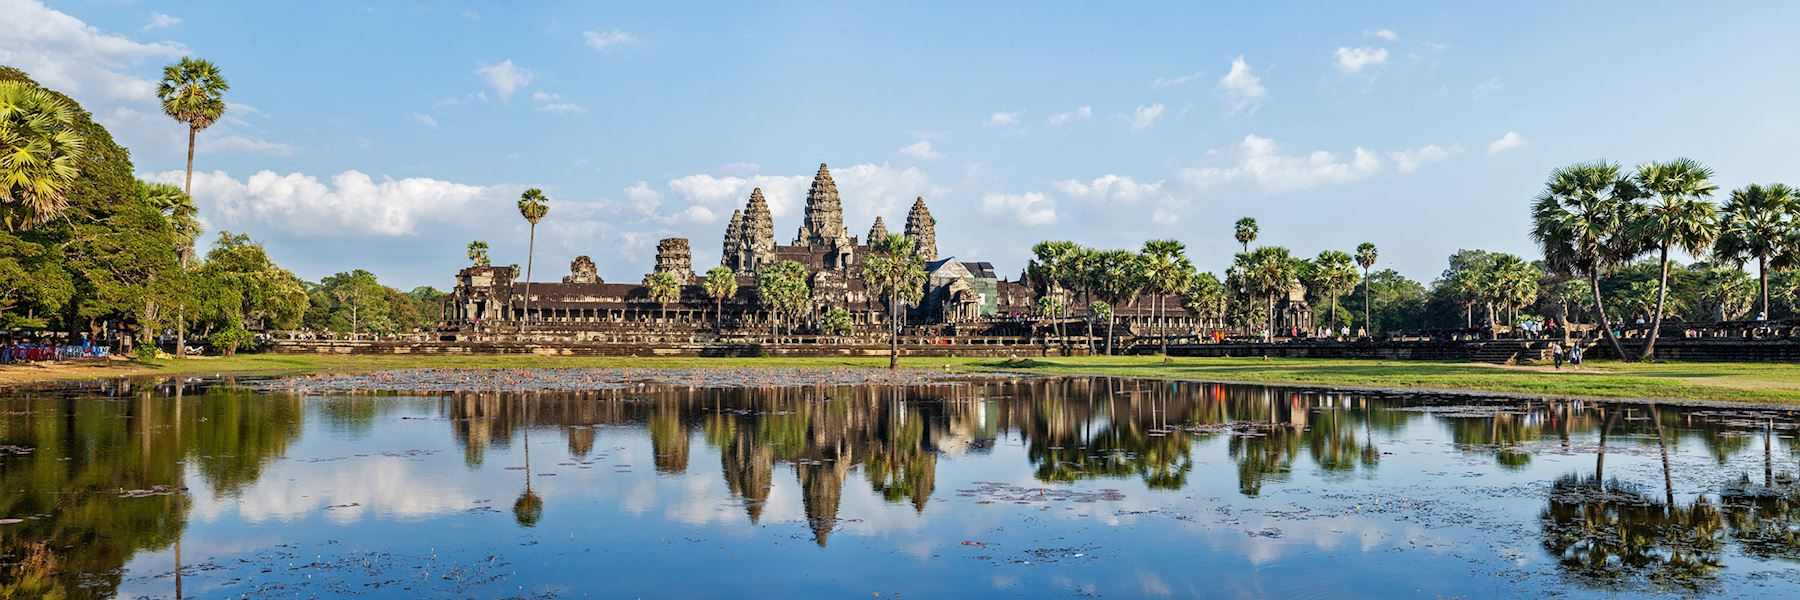 Visit Temples of Angkor, Cambodia